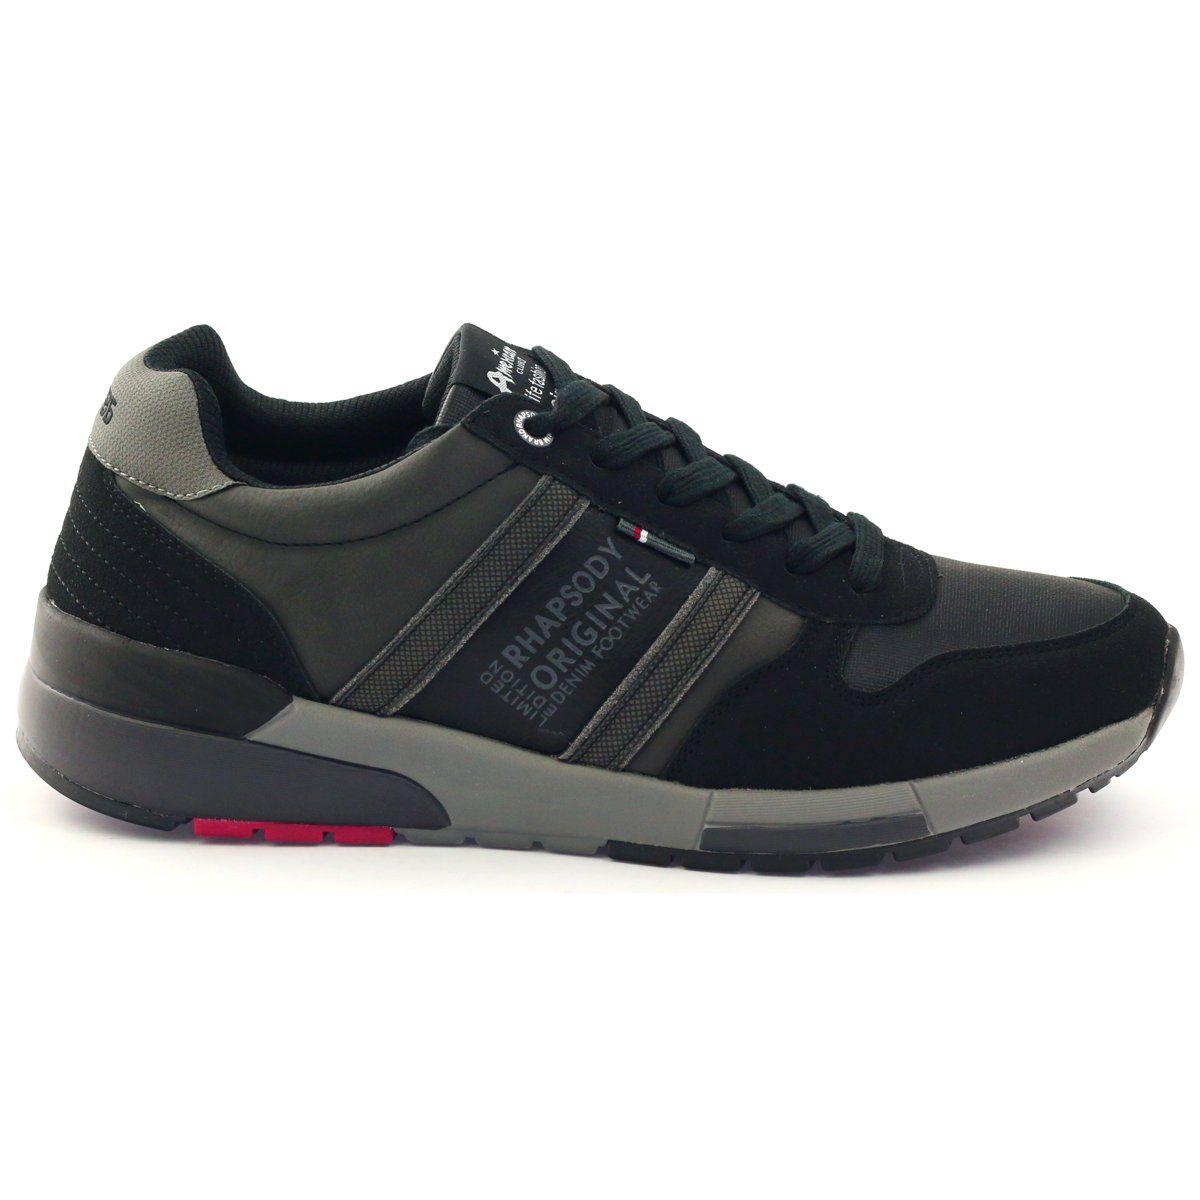 American Club Adi Sportowe Buty Meskie American 603033 Czarne Szare Shoes Adidas Sneakers Adidas